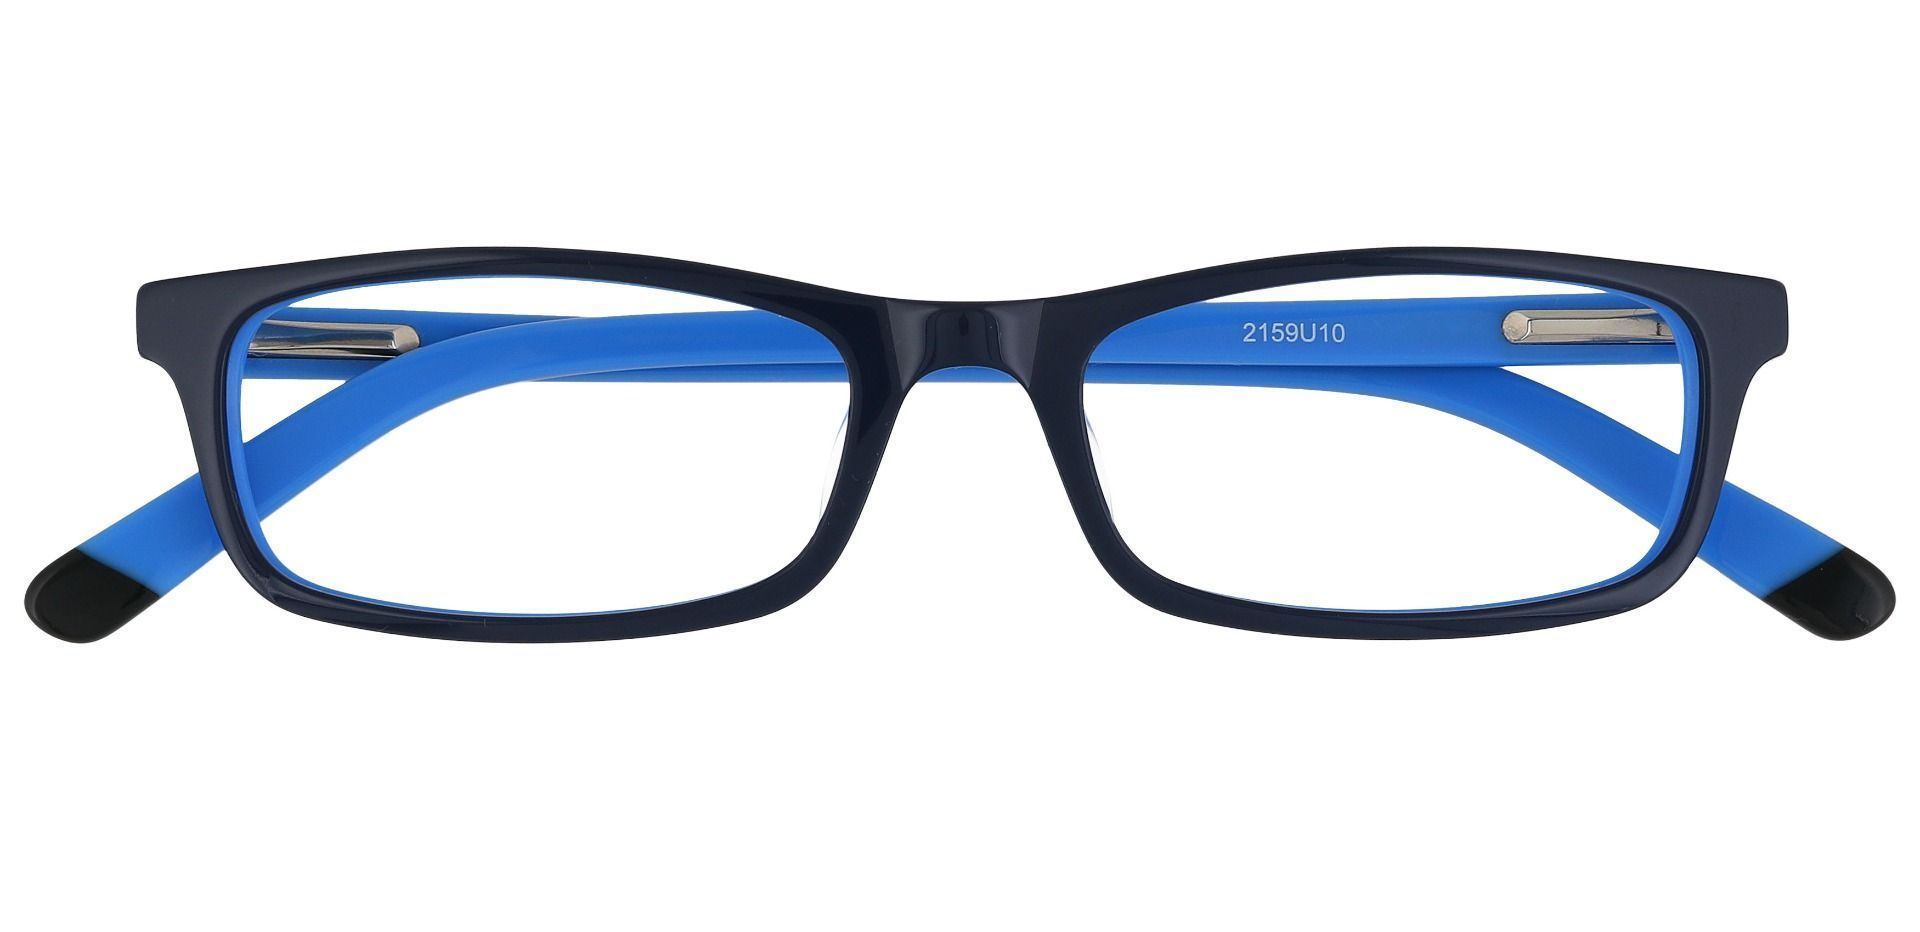 Palisades Rectangle Single Vision Glasses - Blue